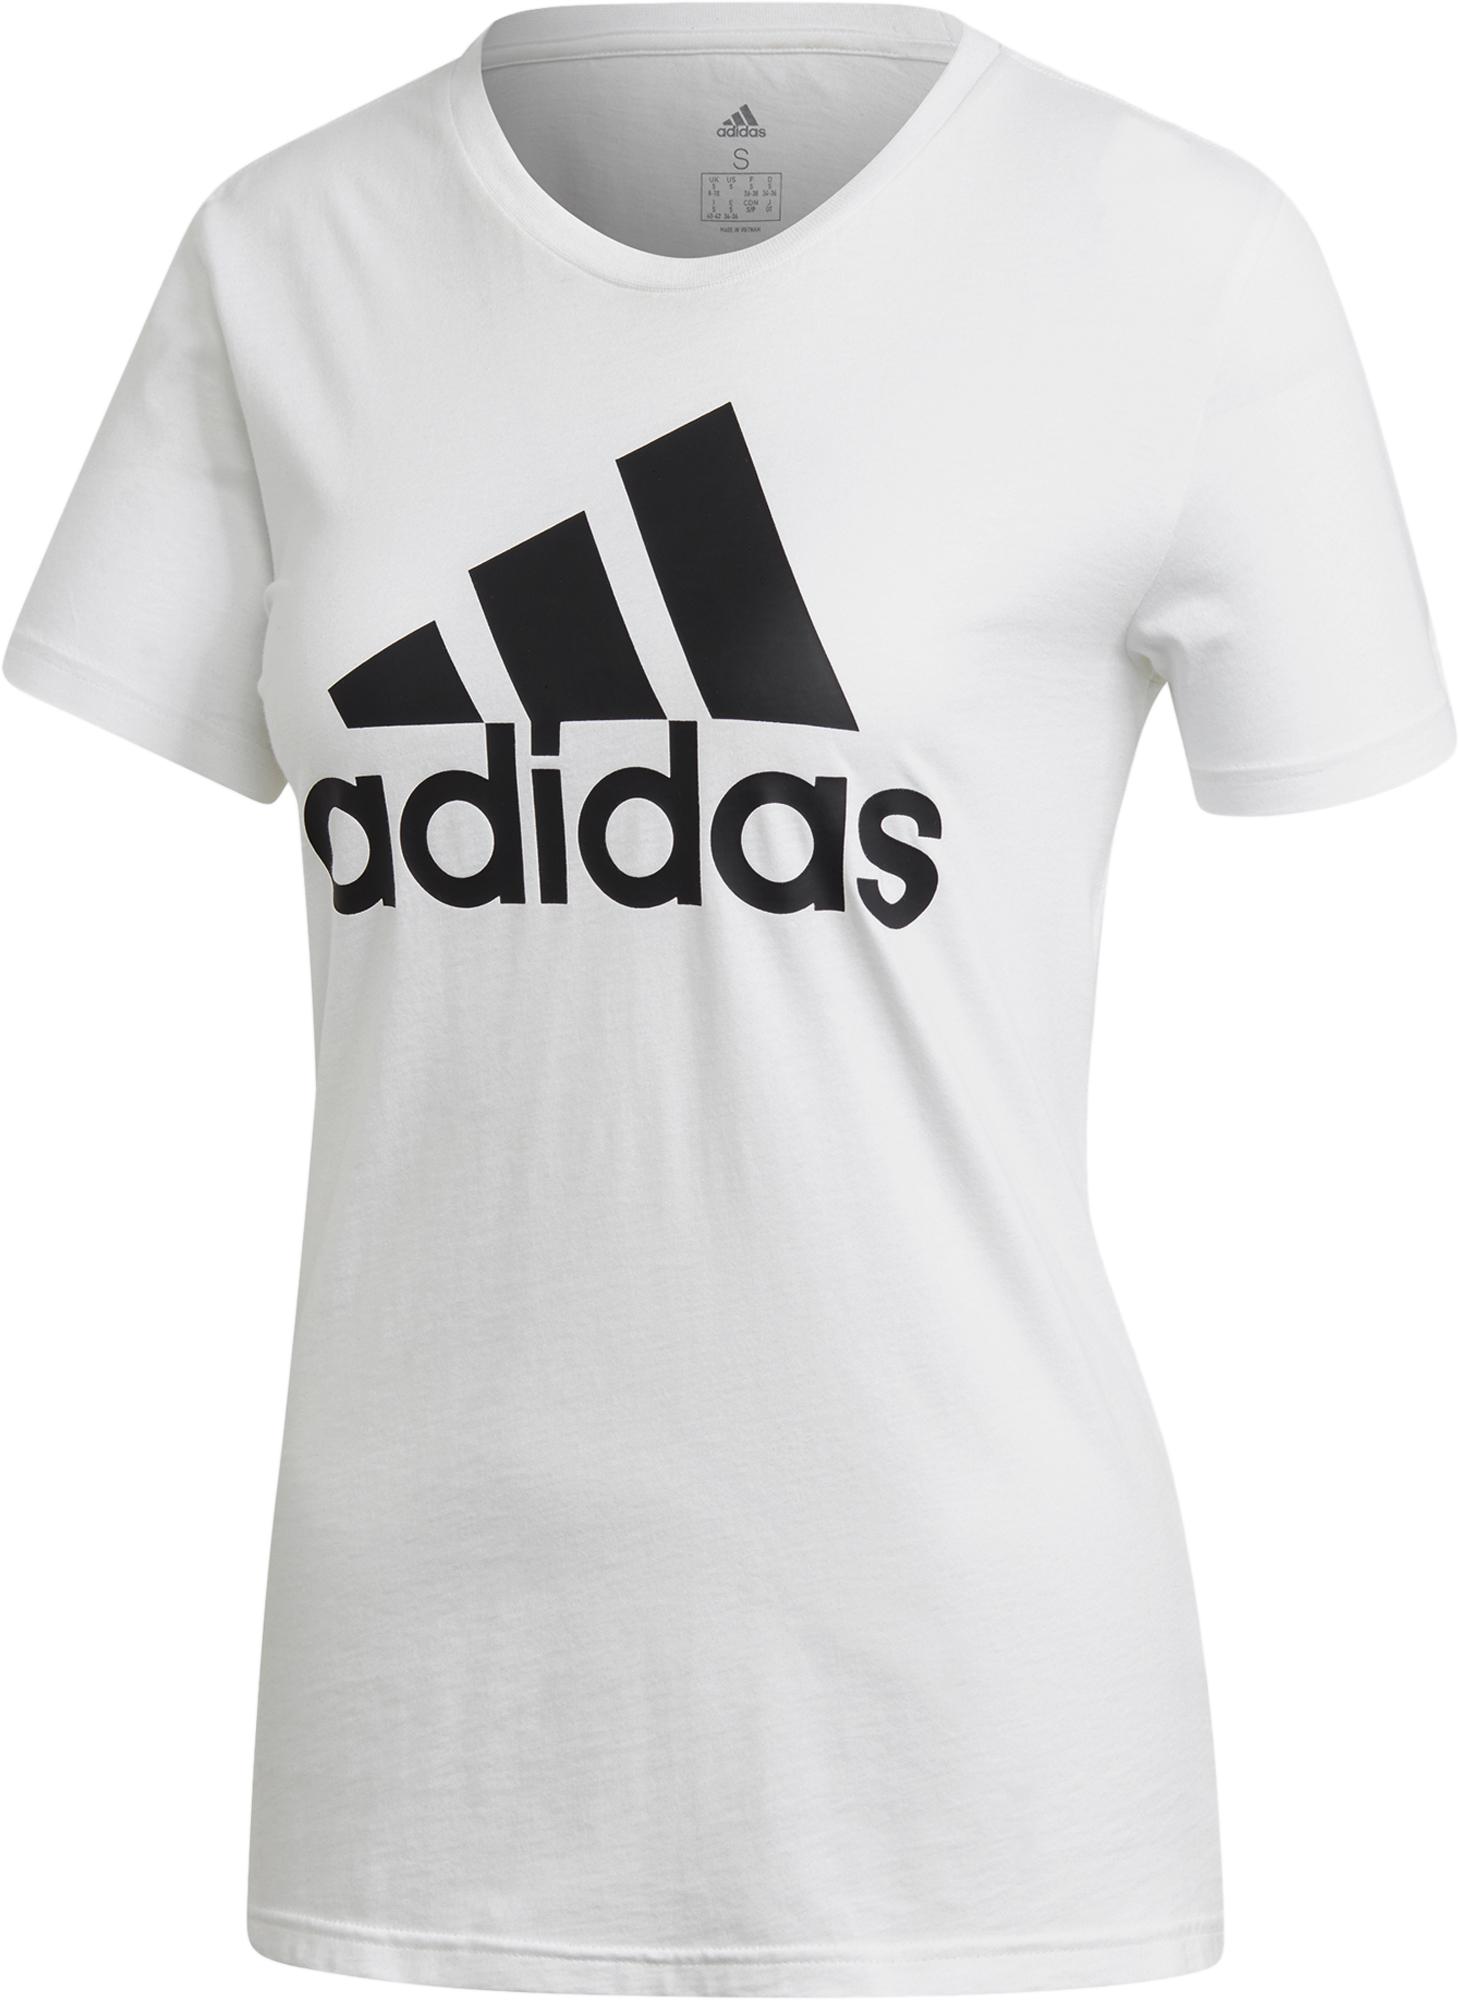 Adidas Футболка женская adidas Must Haves Badge of Sport, размер 46-48